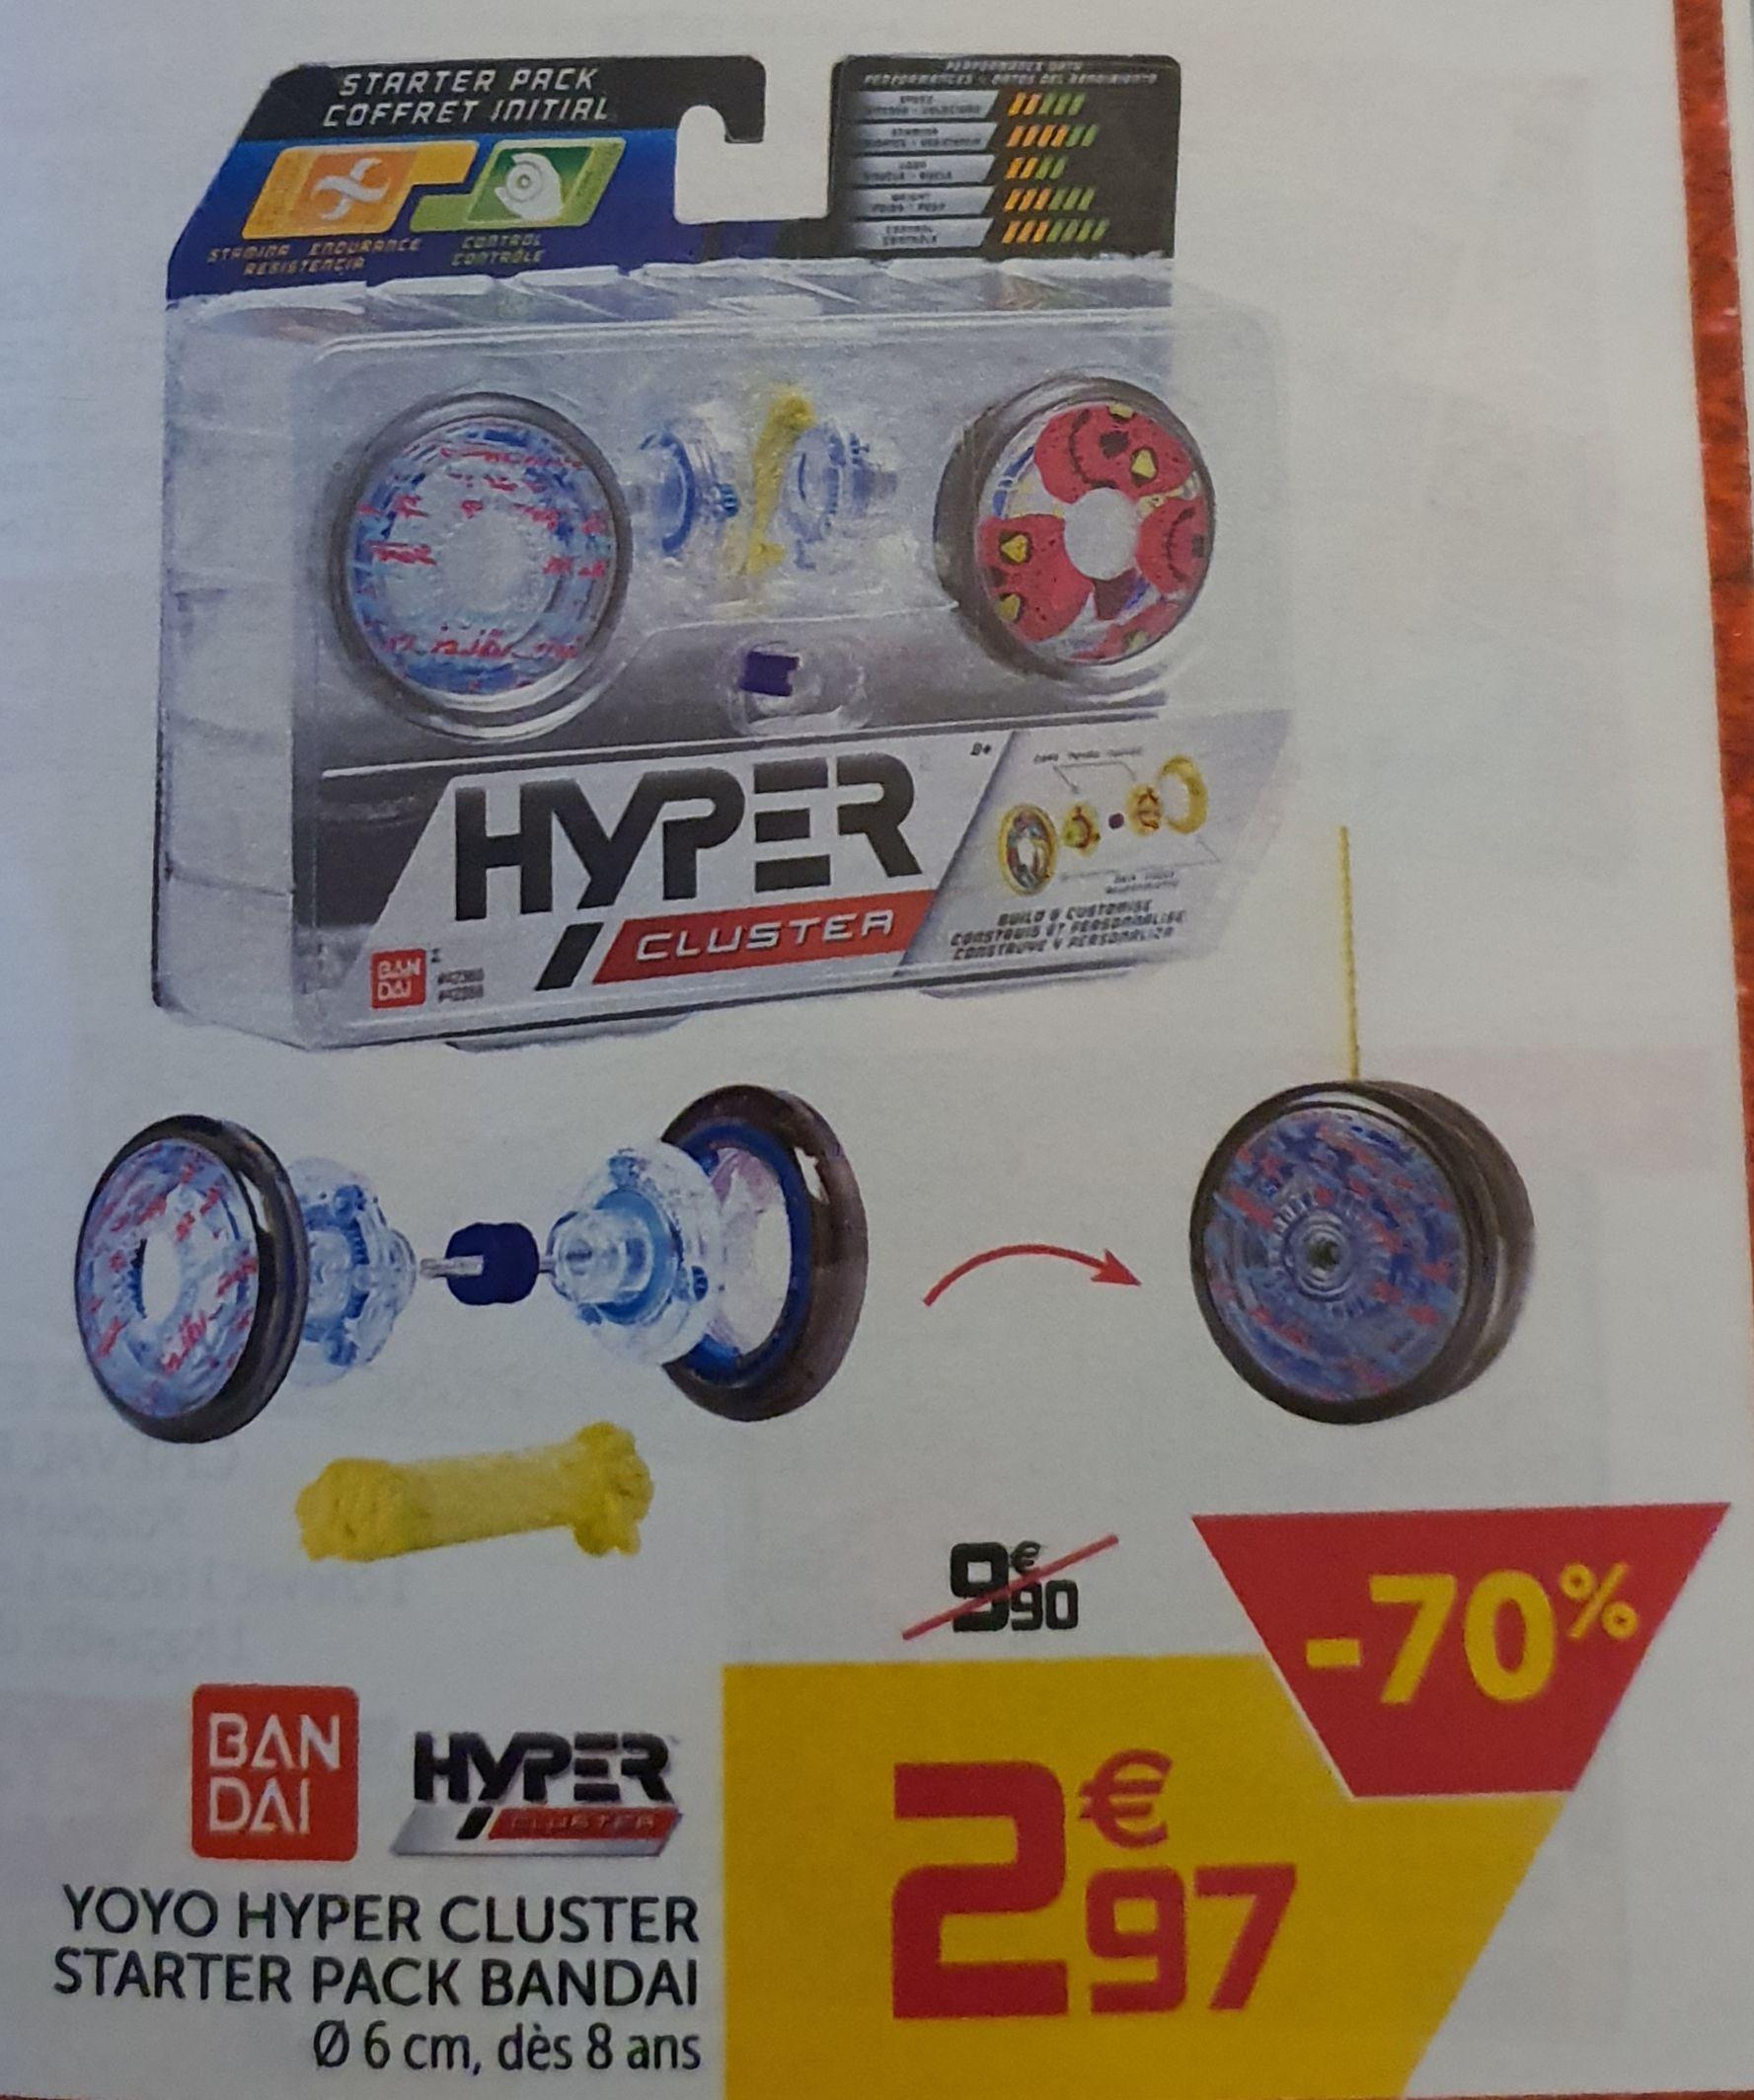 Pack Bandai Starter Pack Yoyo Hyper Cluster